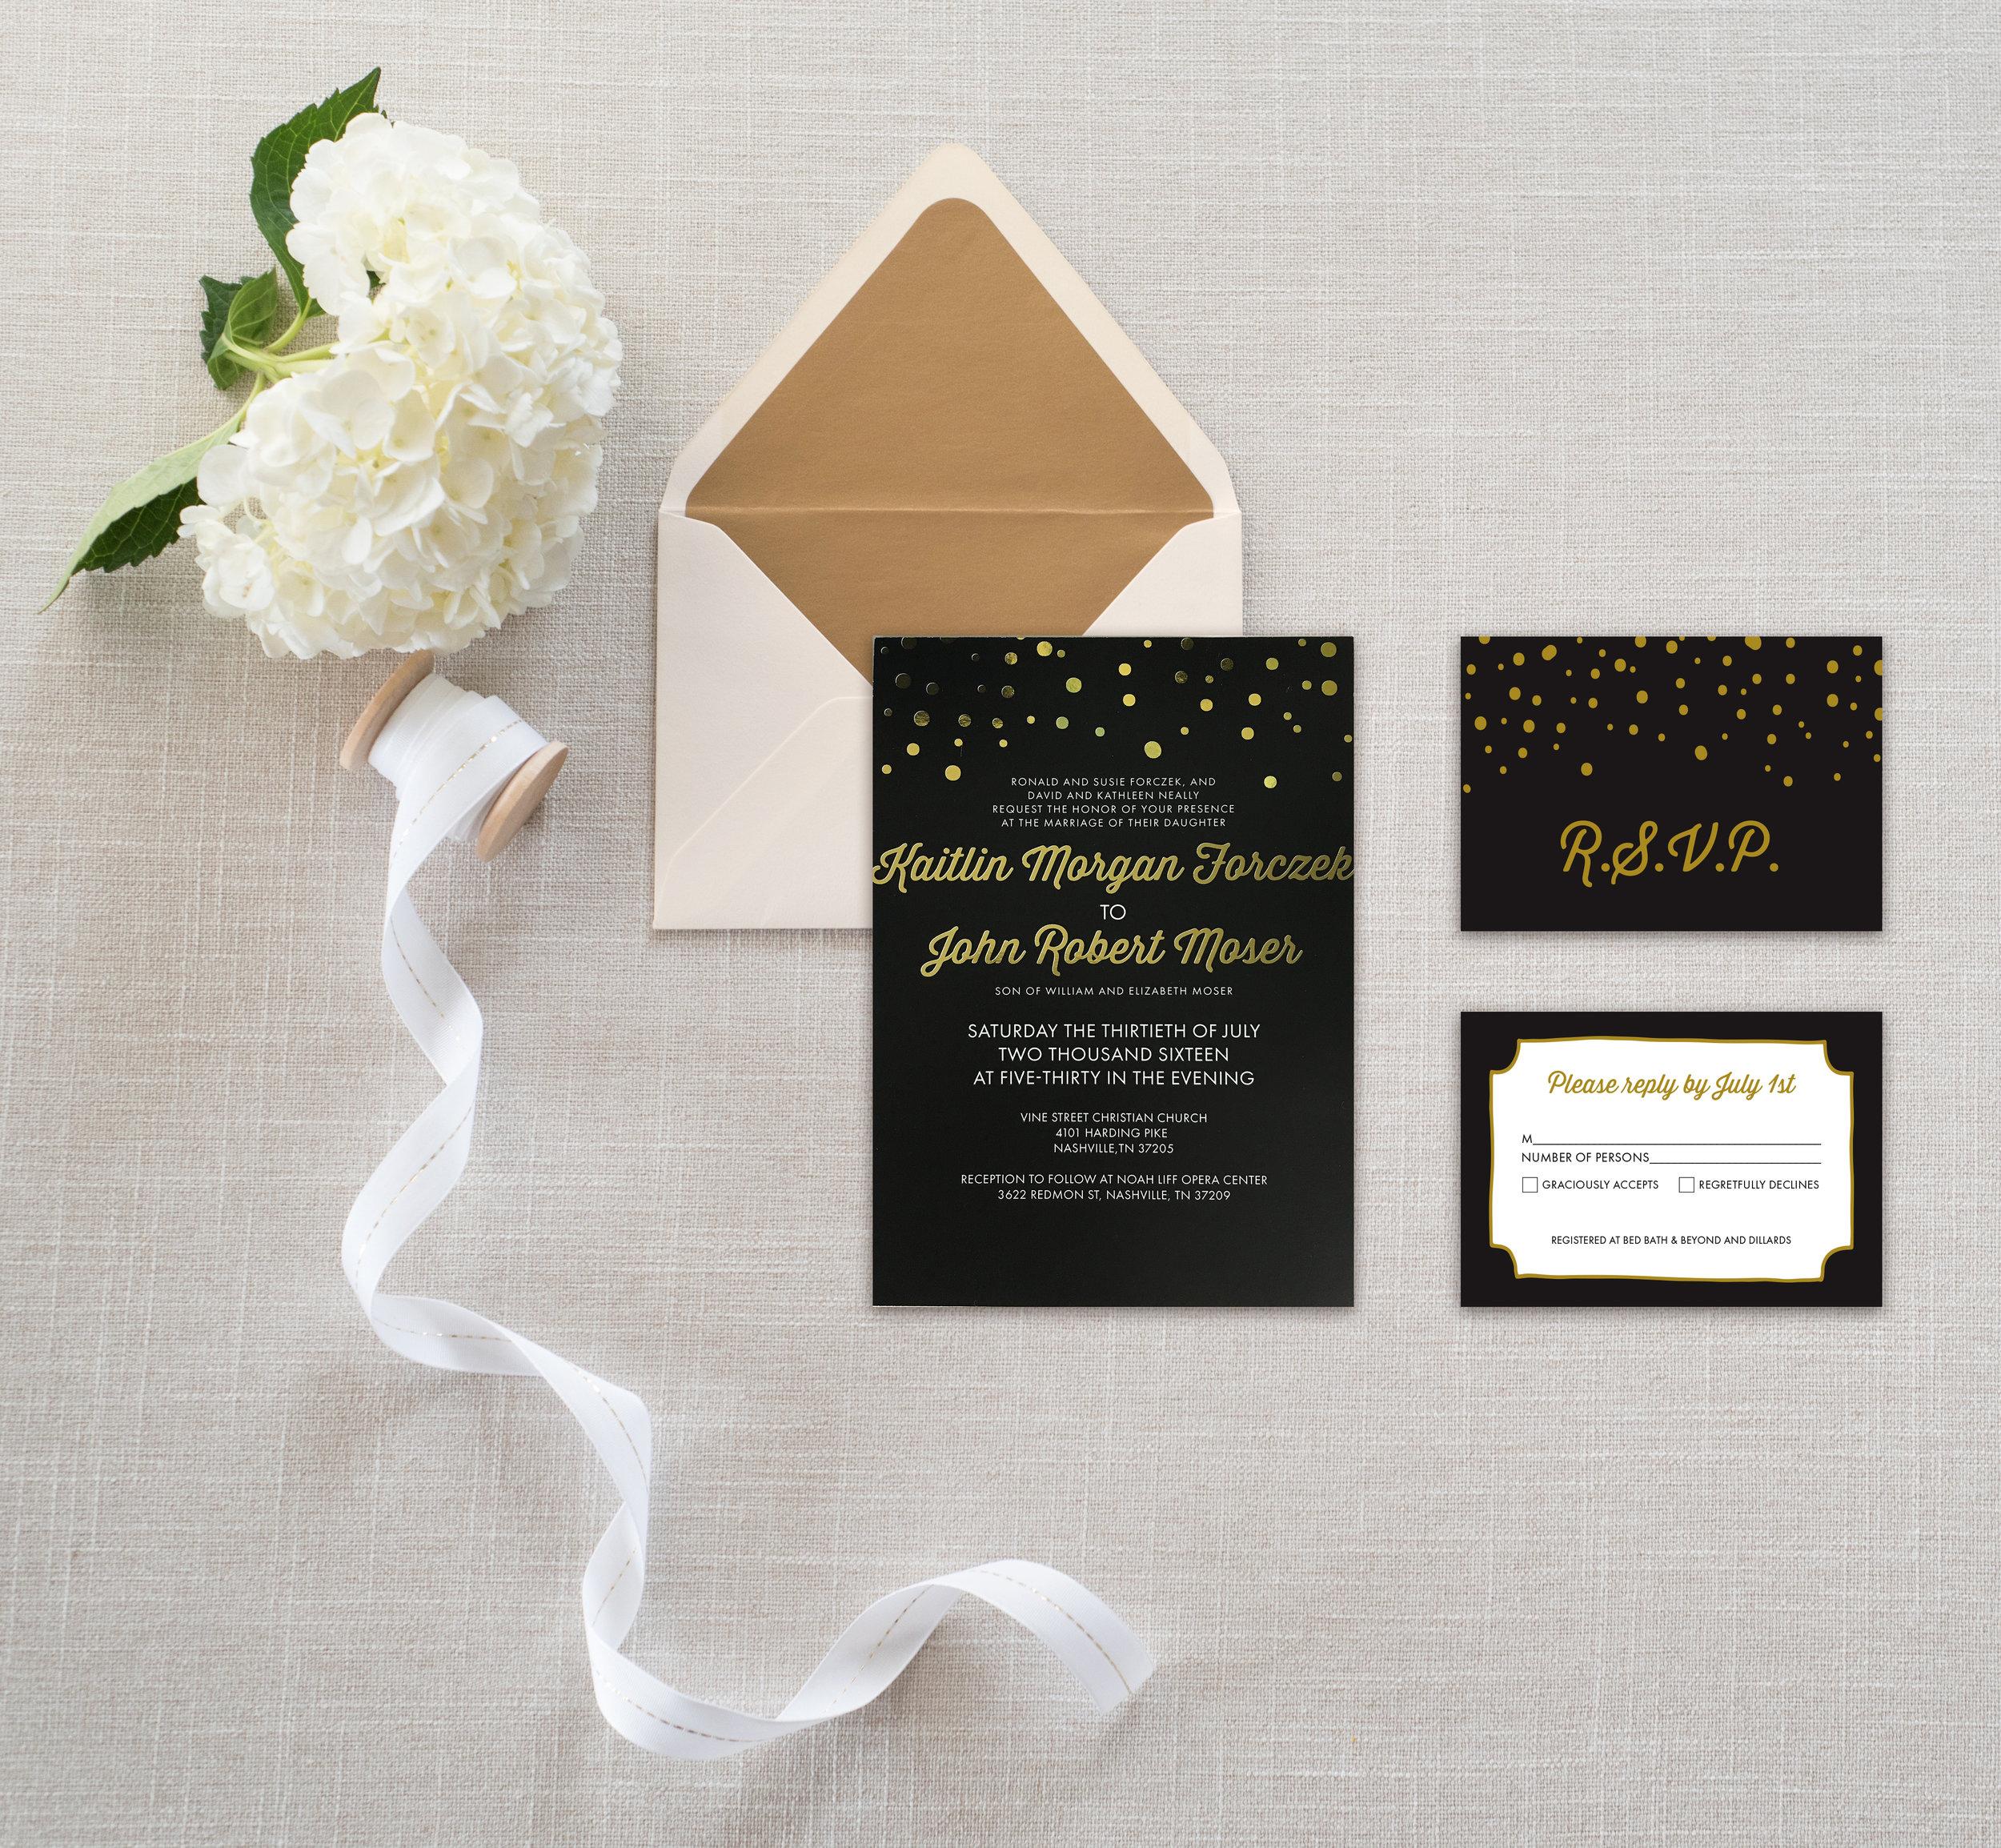 gold+foil+invitation+design-1.jpg